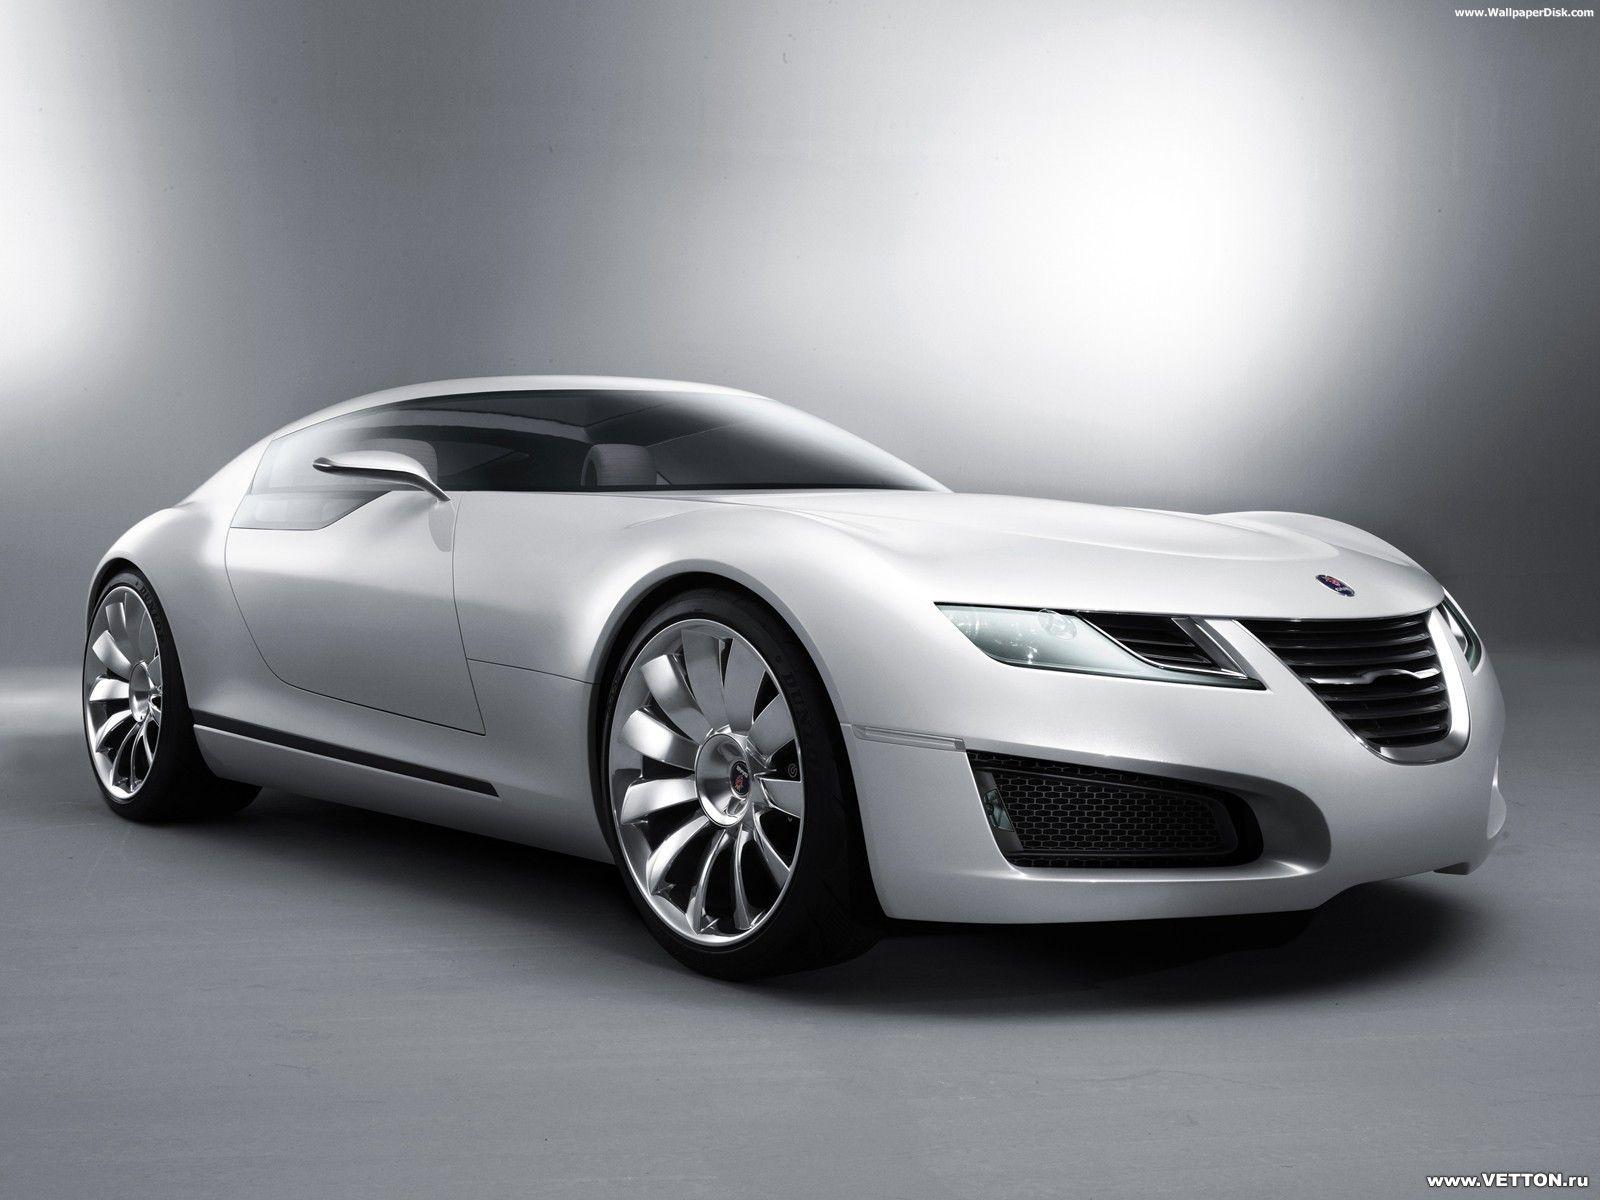 Fast Car Wallpaper Hd: Vehicles: Fast Cars HD Wallpapers